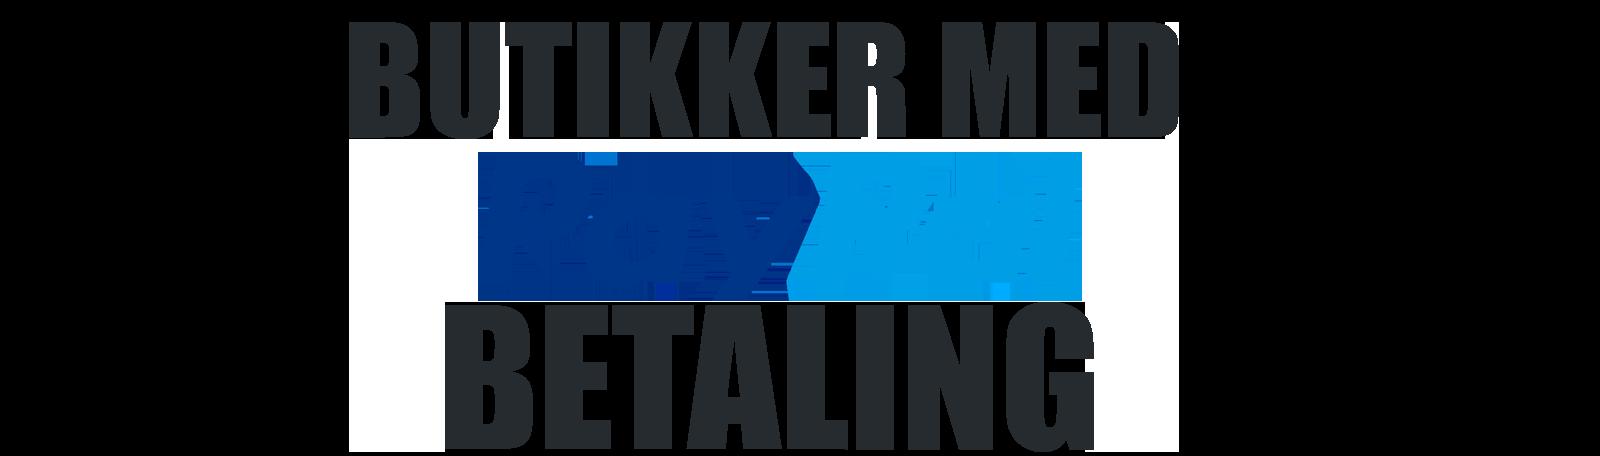 Paypal-Betaling